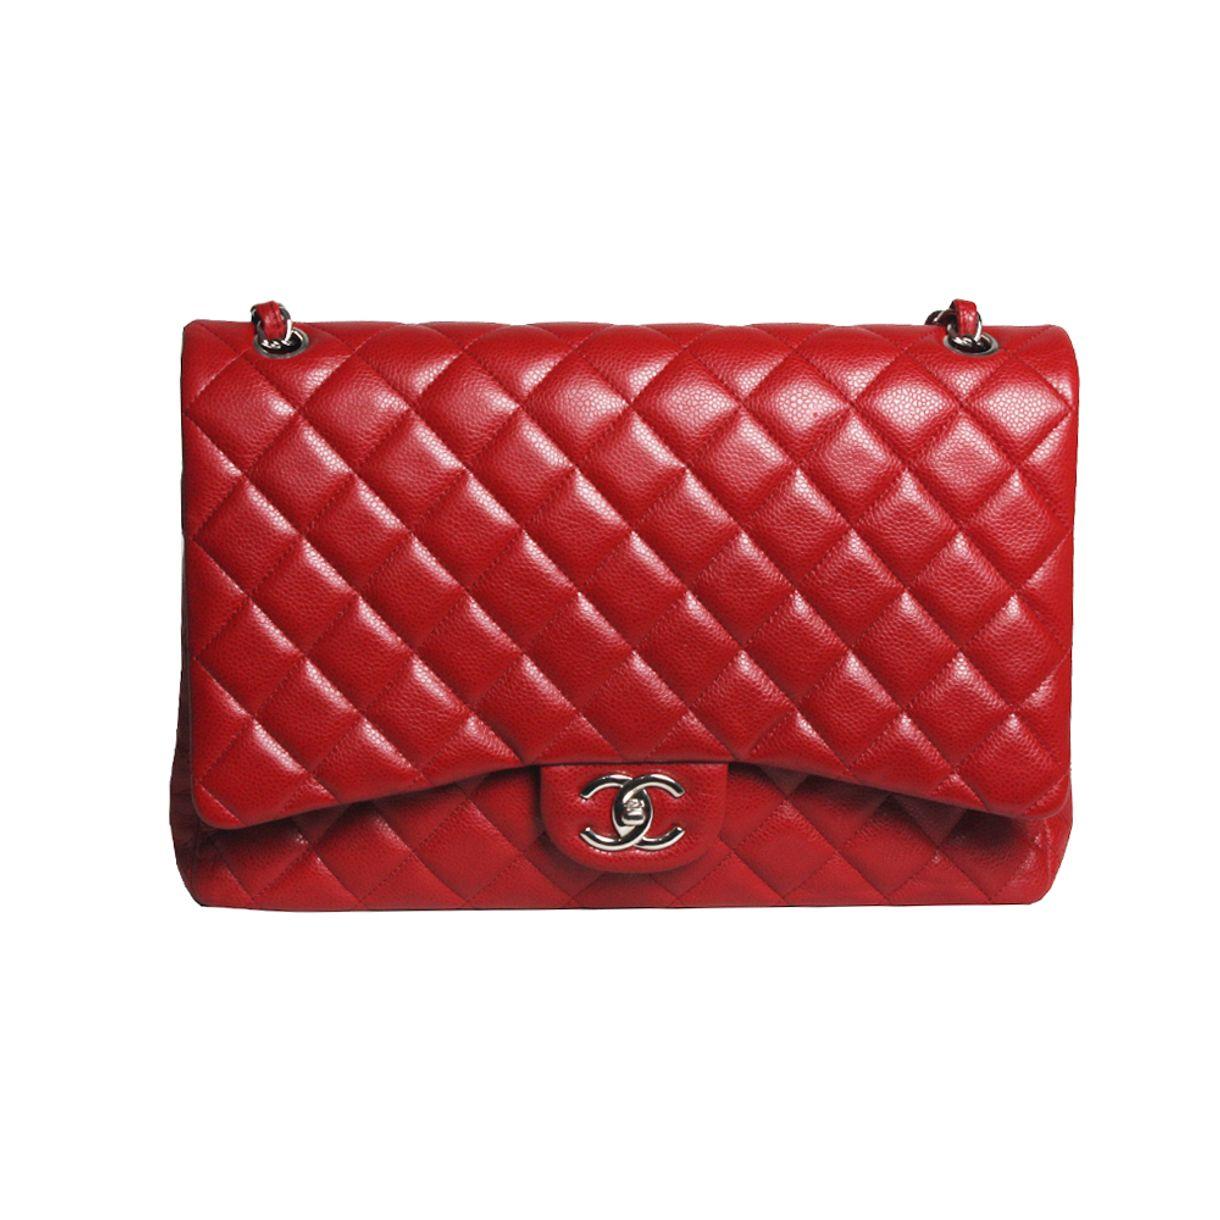 Bolsa-Chanel-Double-Flap-Maxi-Caviar-Red